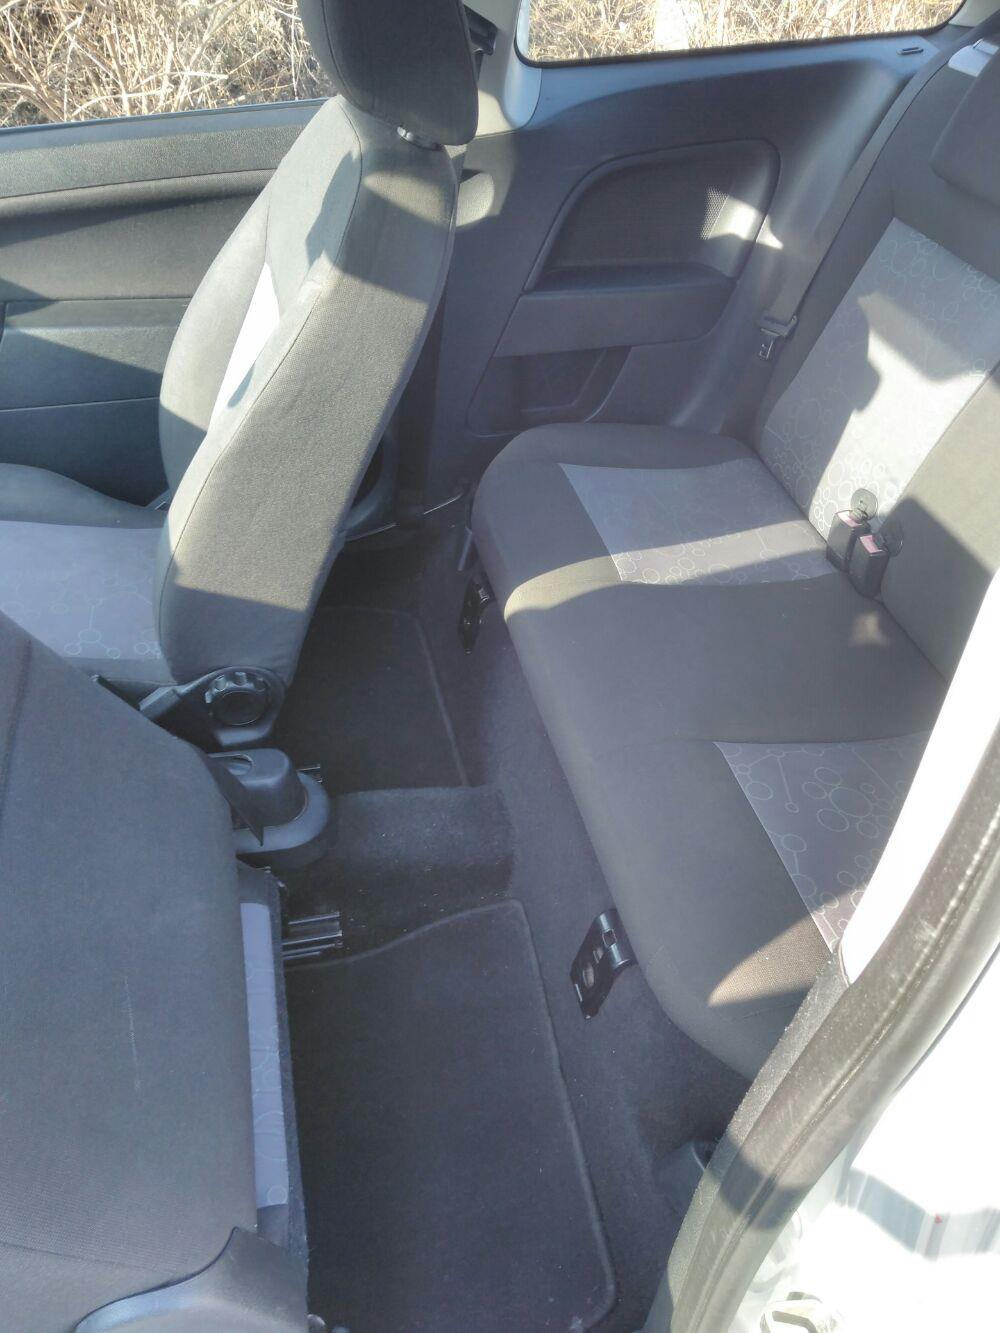 Ford Fiesta 1.4 tdi an 2008 Rar făcut  - imagine 7